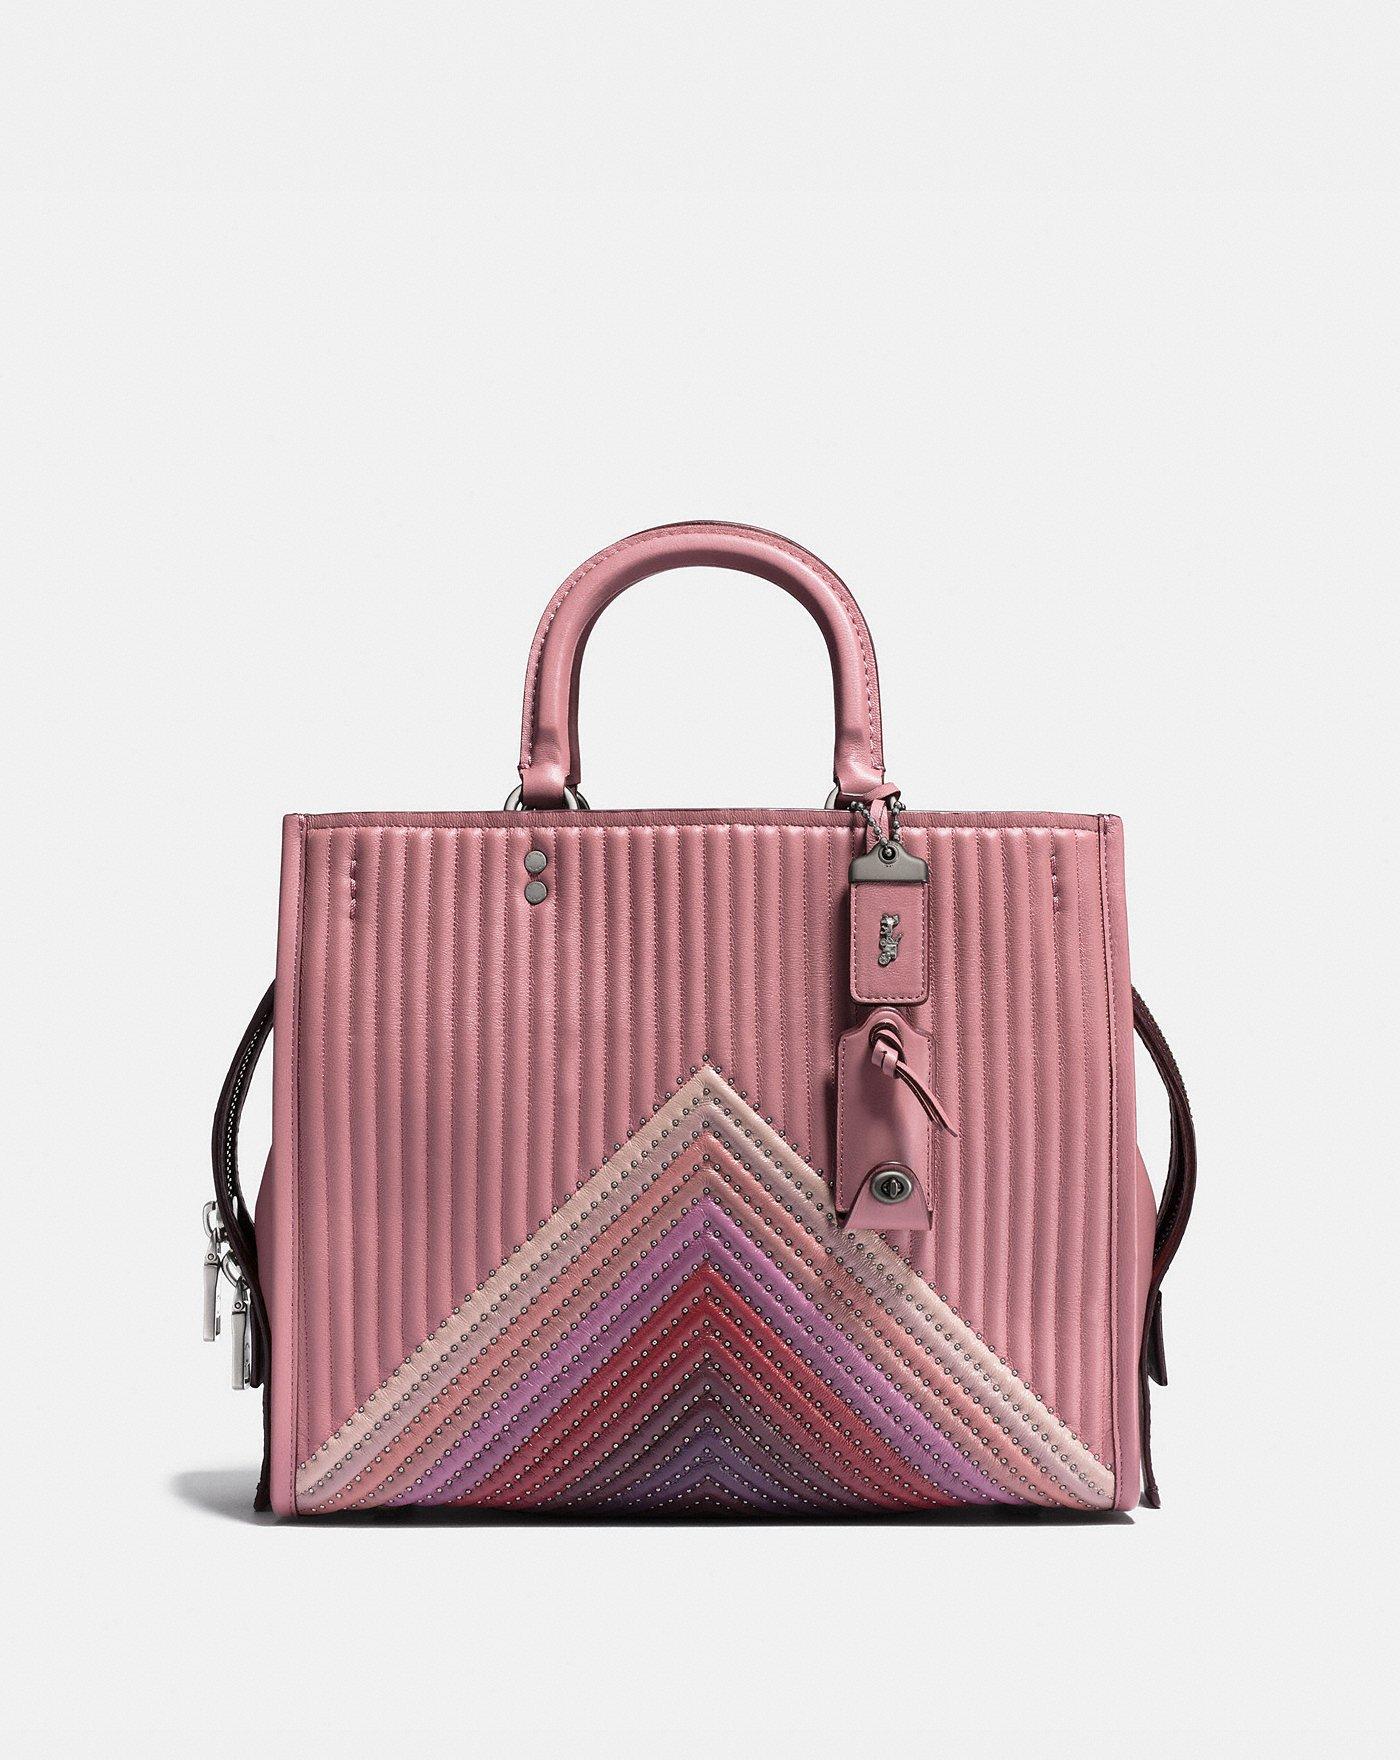 Большая классическая сумка Coach черного цвета (Fashionette)  https   rstyle.me n c93u7uchkpf — Маленькая сумка Coach черная с паетками  (Fashionette) ... e3897303da9cc